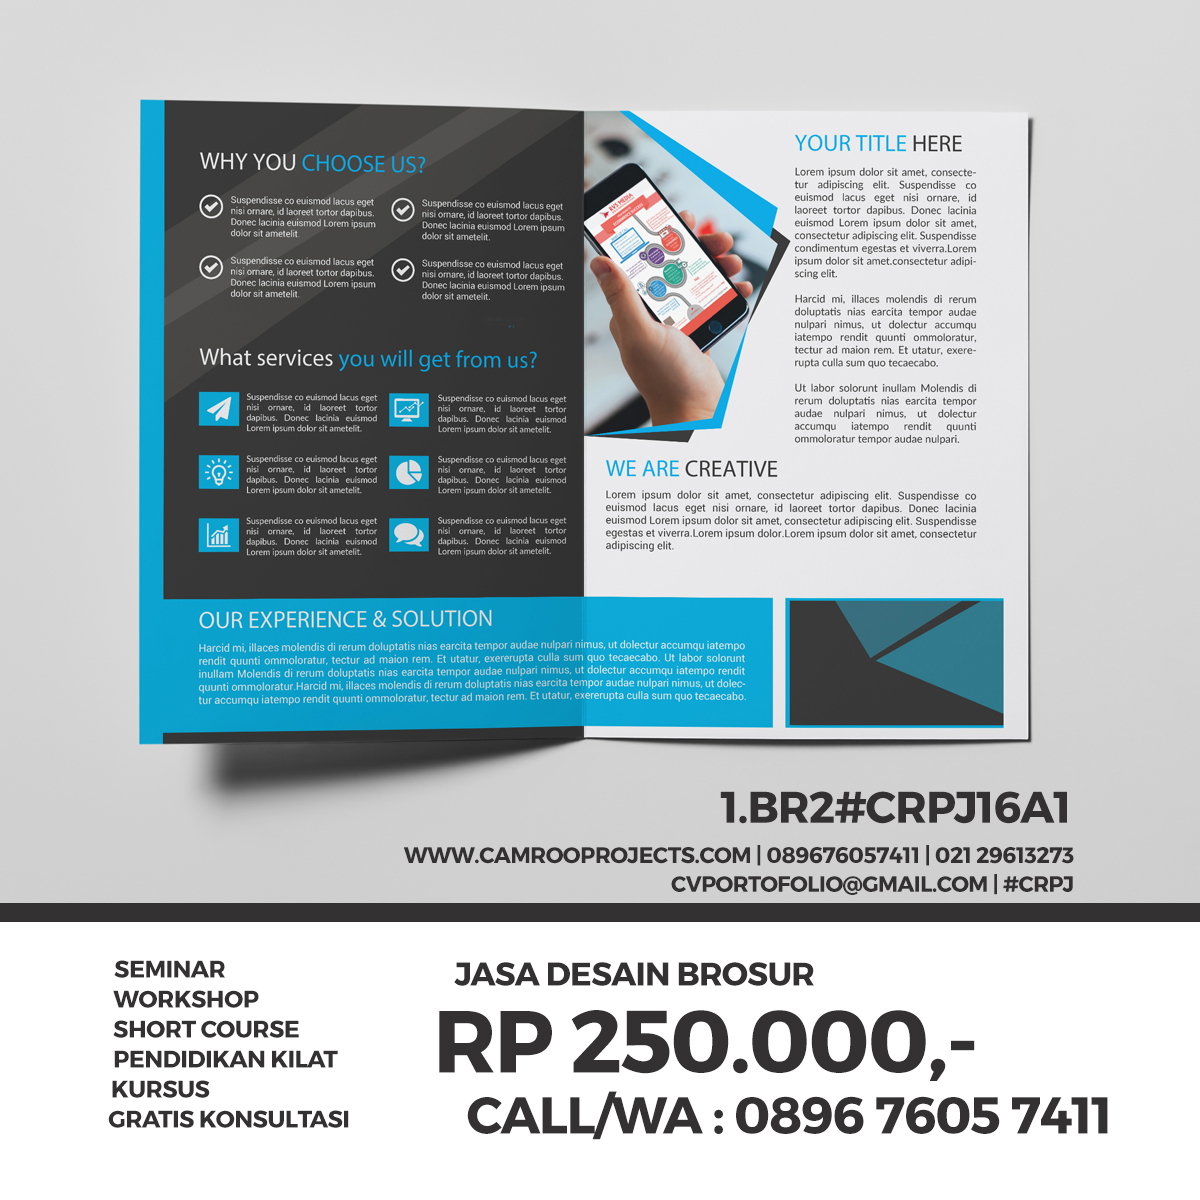 Jasa Desain Flyer | Profesional | Call/WA 0896 760 574 11